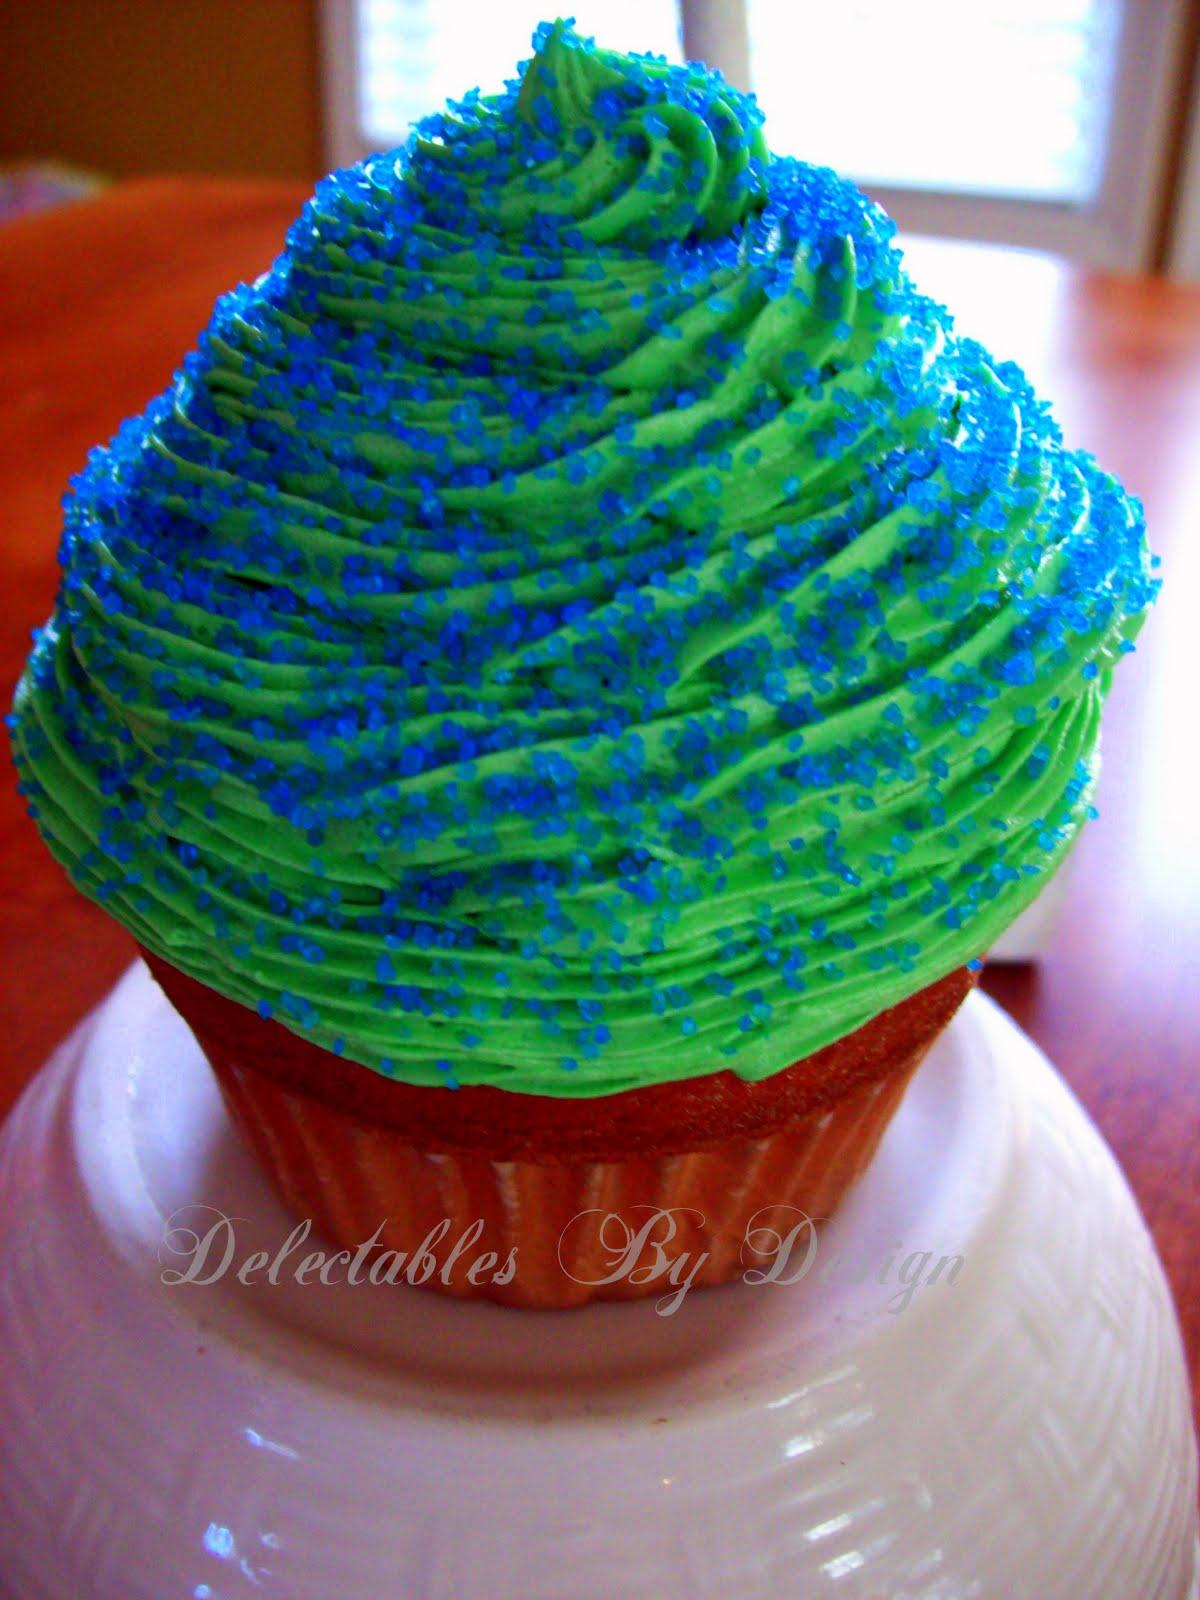 Cakes By Design Jumbo Cupcakes